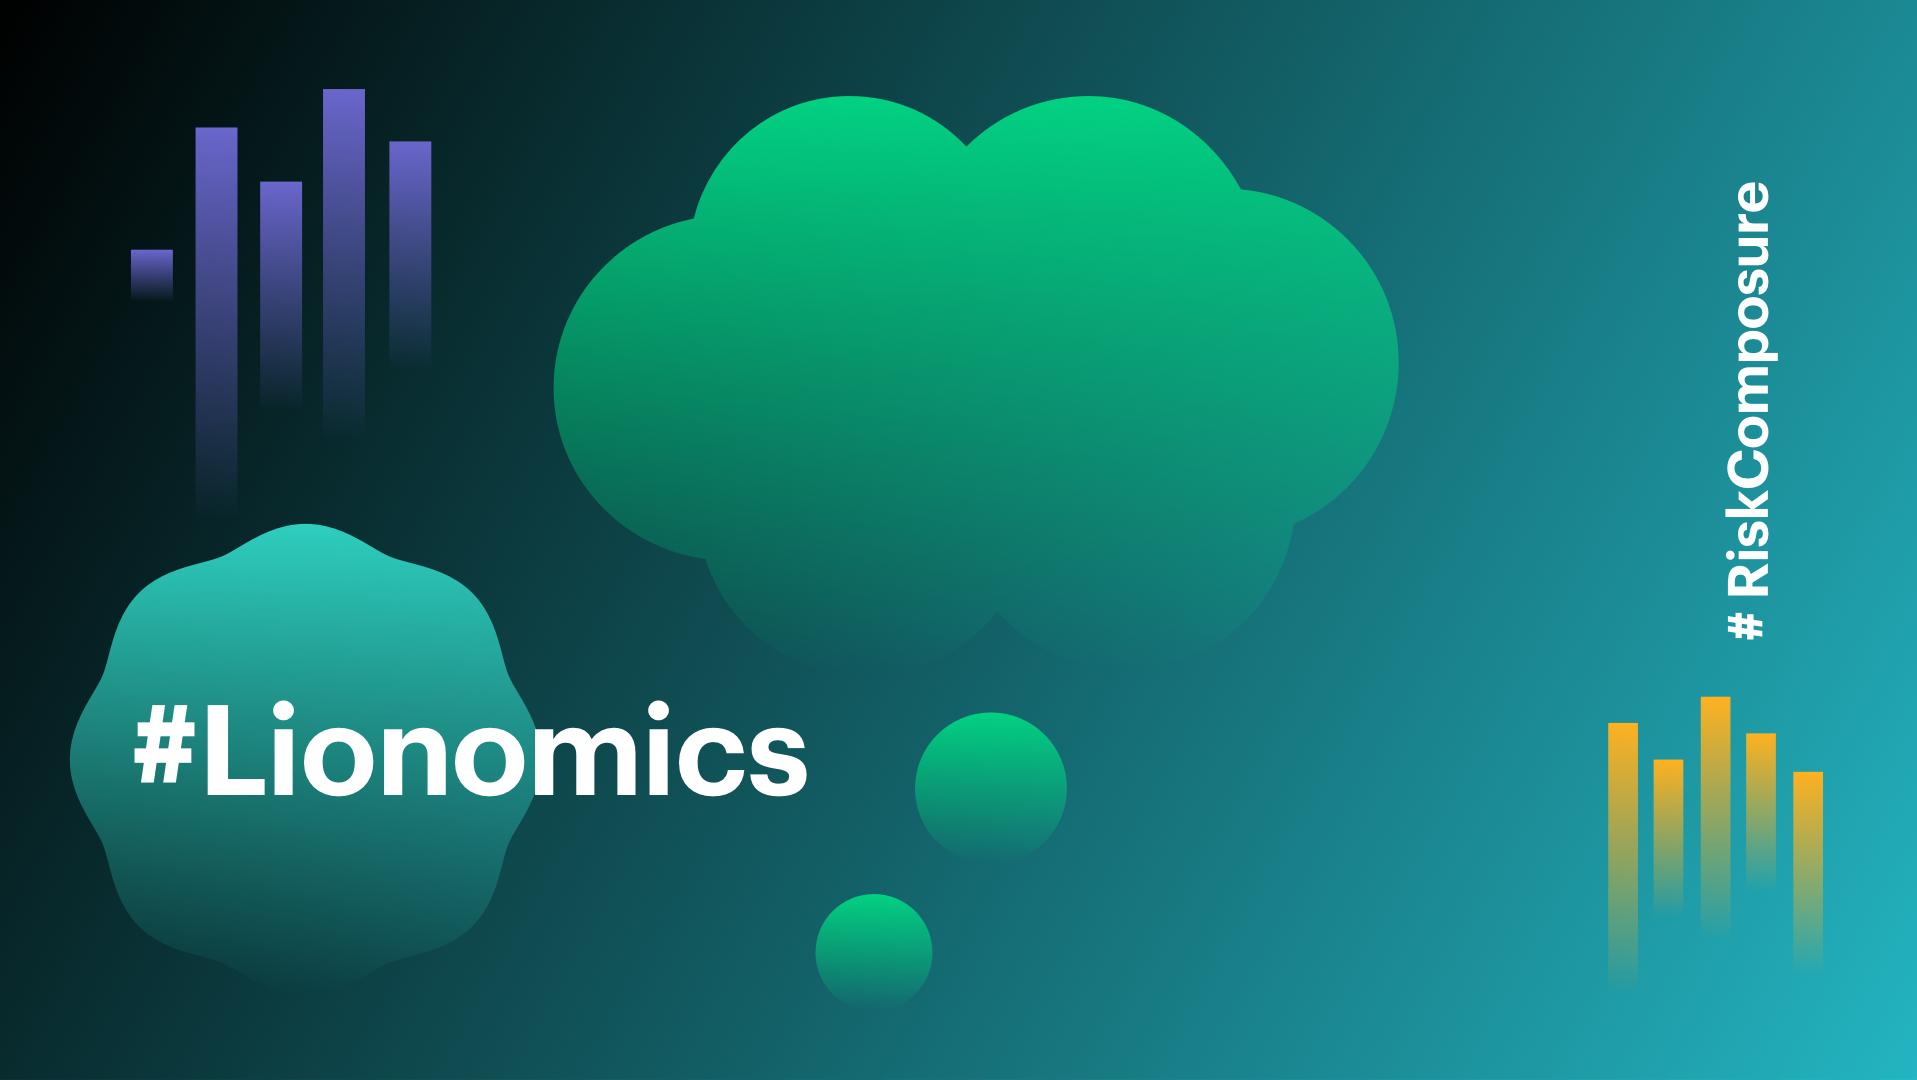 Lionomics 9 Blog Risk Composure 08132018